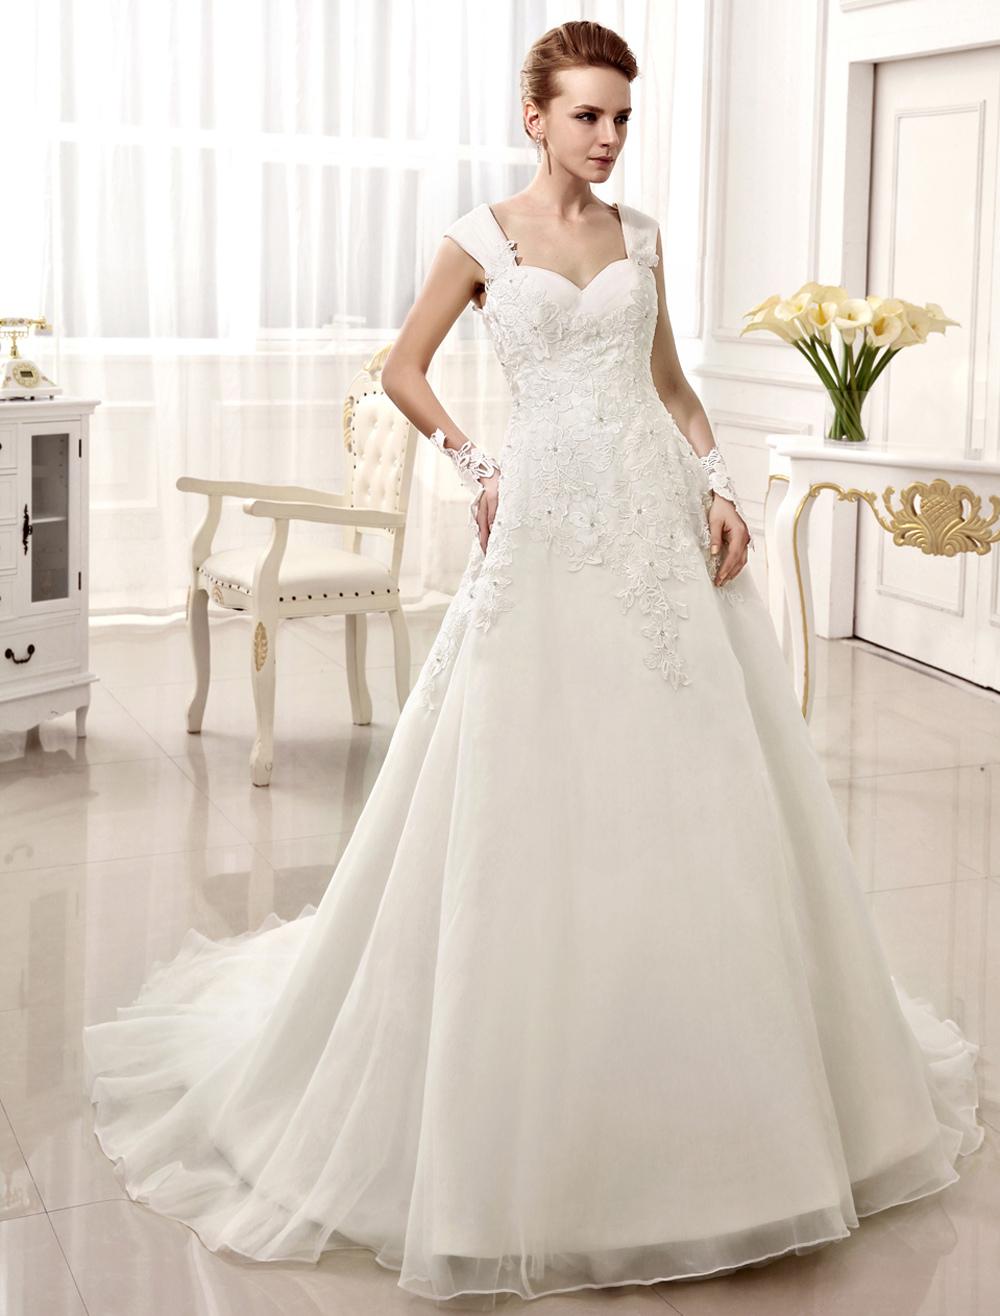 A-line Chapel Train Applique Ivory Brides Wedding Dress with Sweetheart Neck Spaghetti Strap  Milanoo